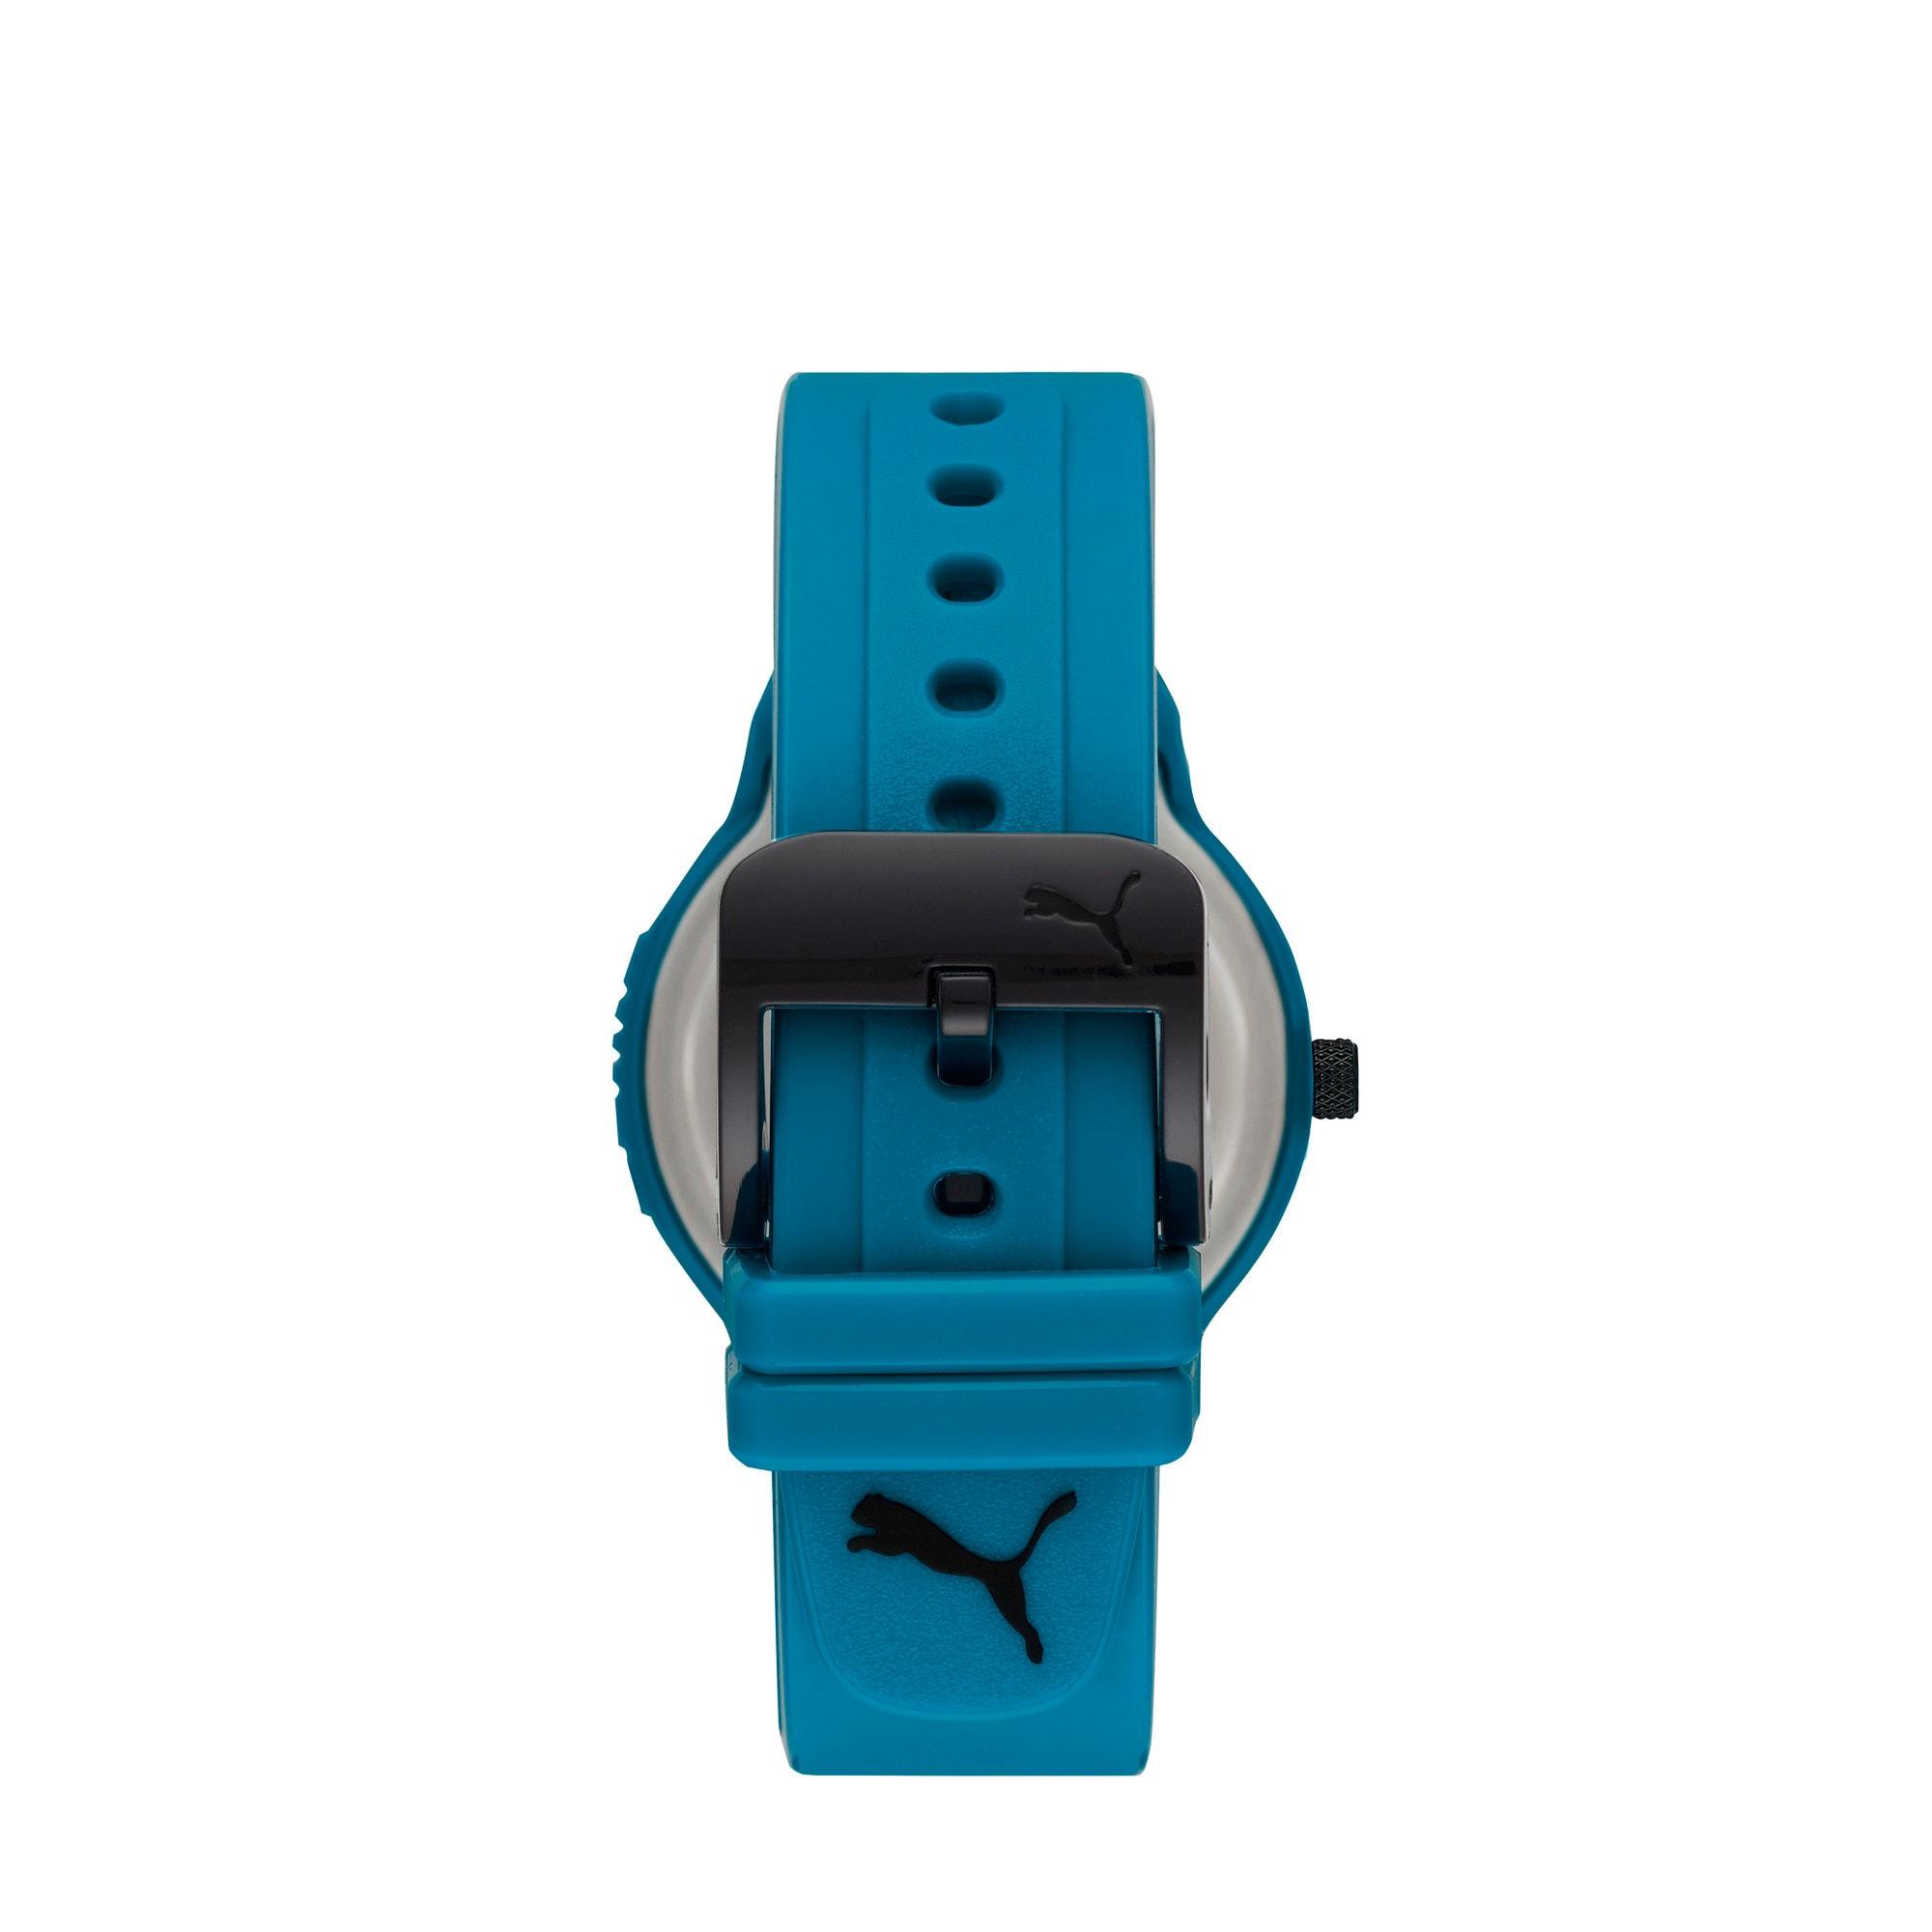 Thumbnail 3 of Reset v2 Watch, Blue/Blue, medium